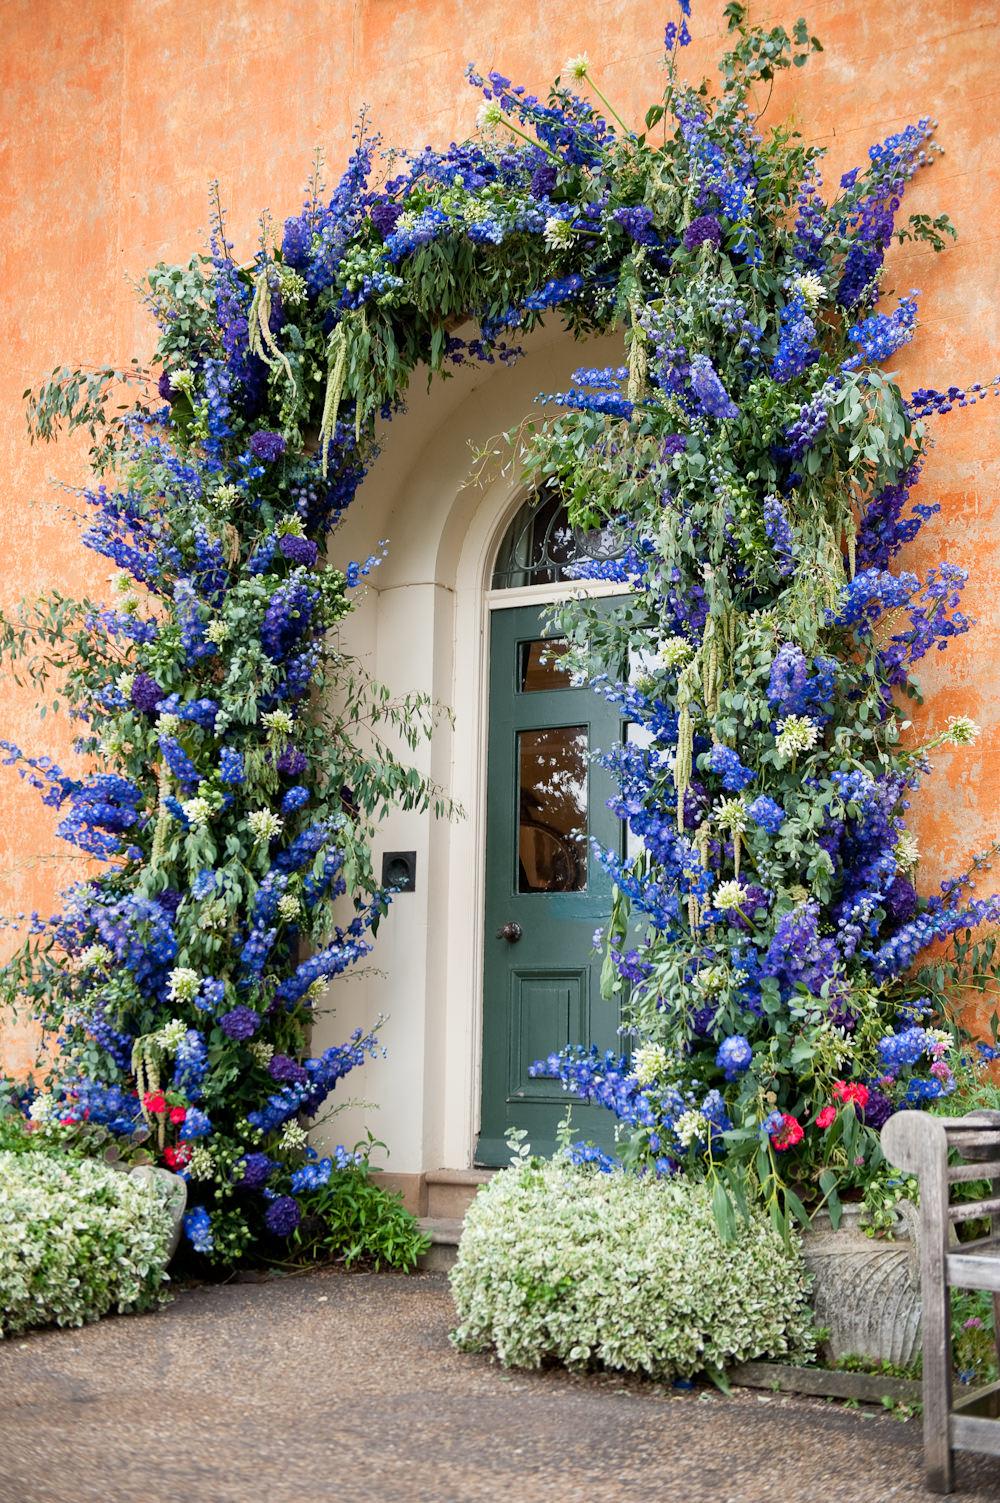 Flower Arch Archway Doorway Arrangement Delphinium Floral Wedding Rachael Connerton Photography